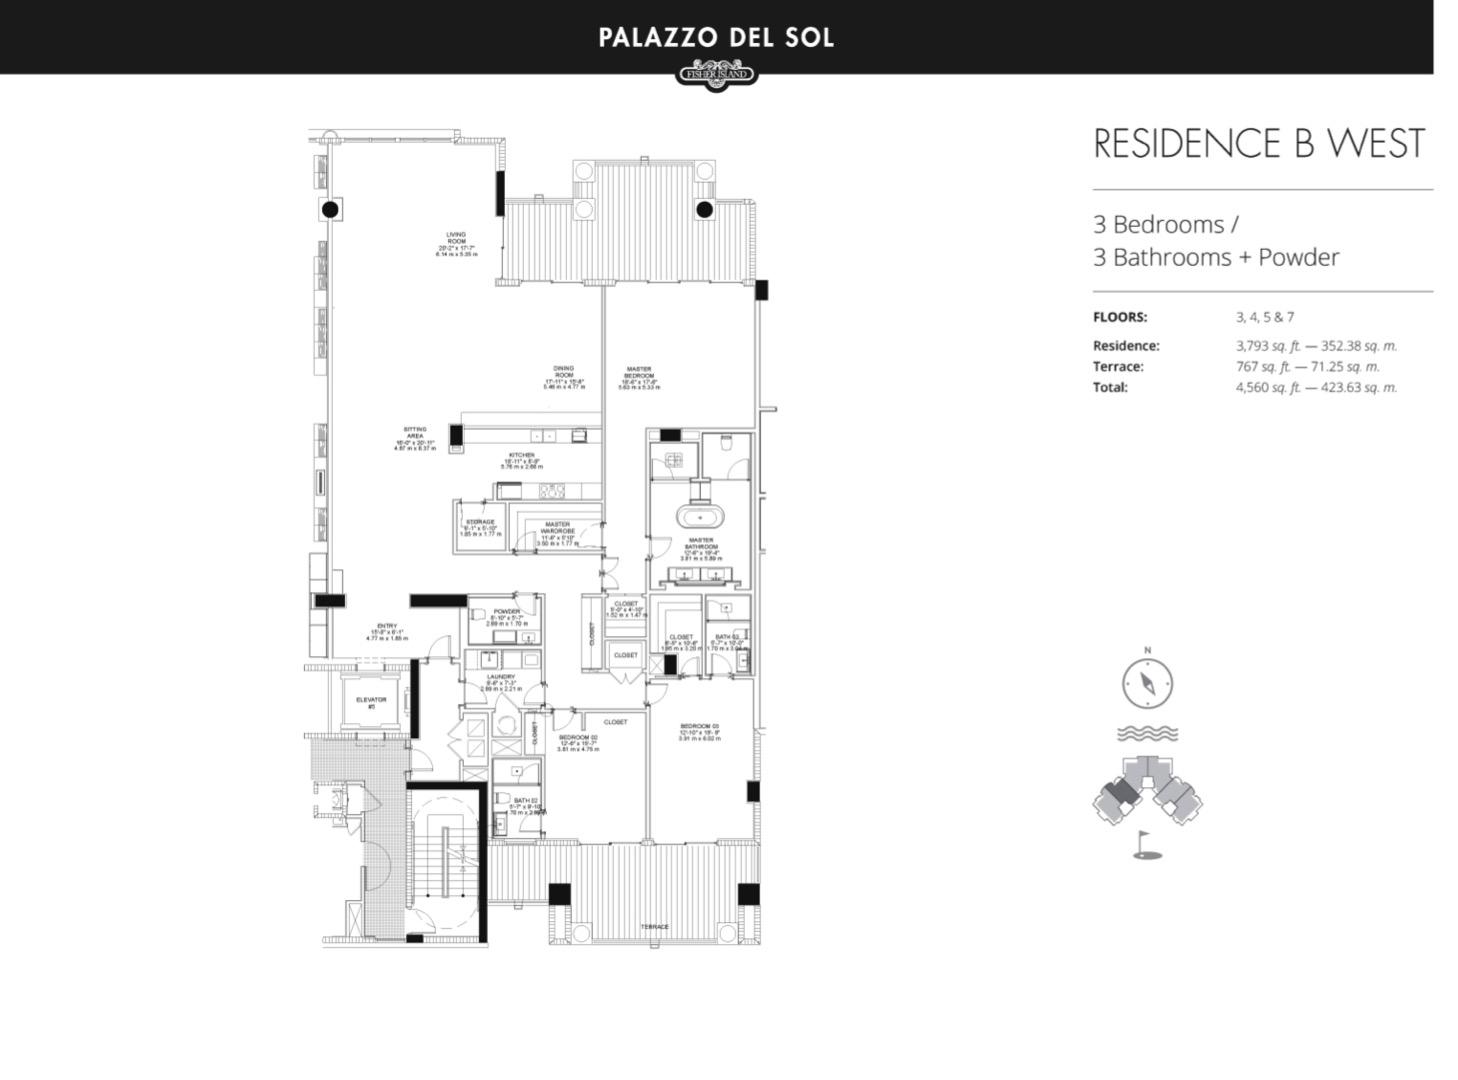 Floor plan image B West 4-5 - 3/3  - 3793 sqft image